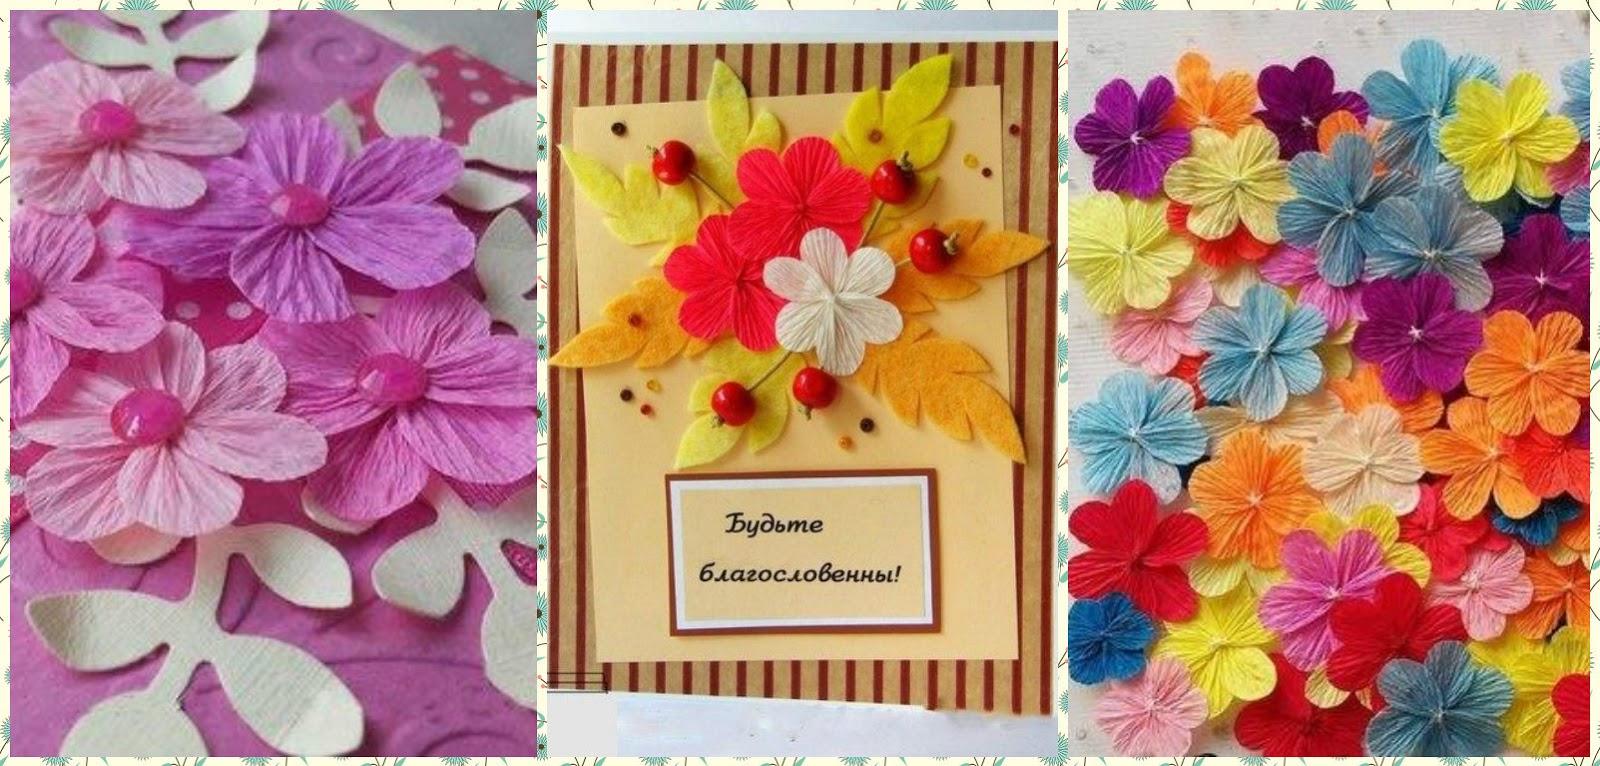 Decoracion con flores de papel para baby shower for Decoracion con cenefas de papel